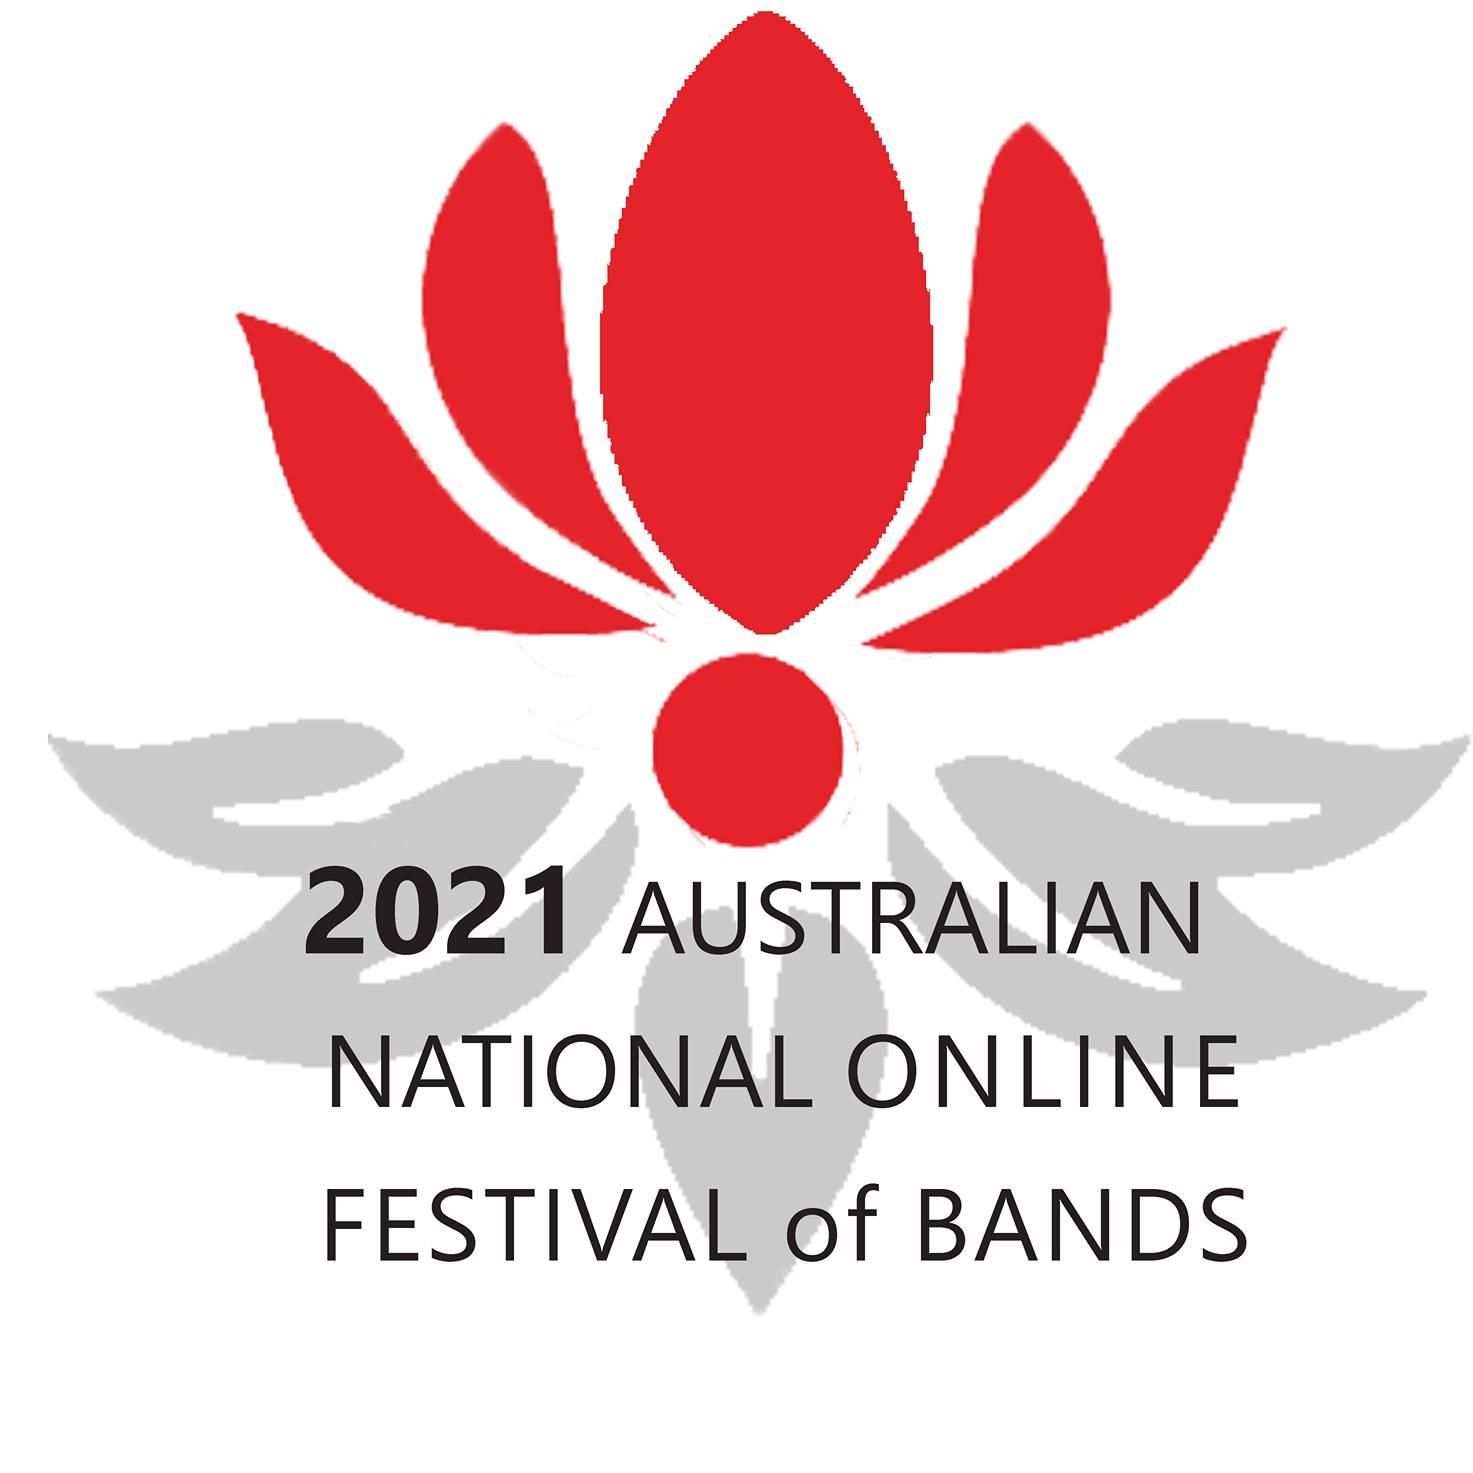 Aus festival of bands online